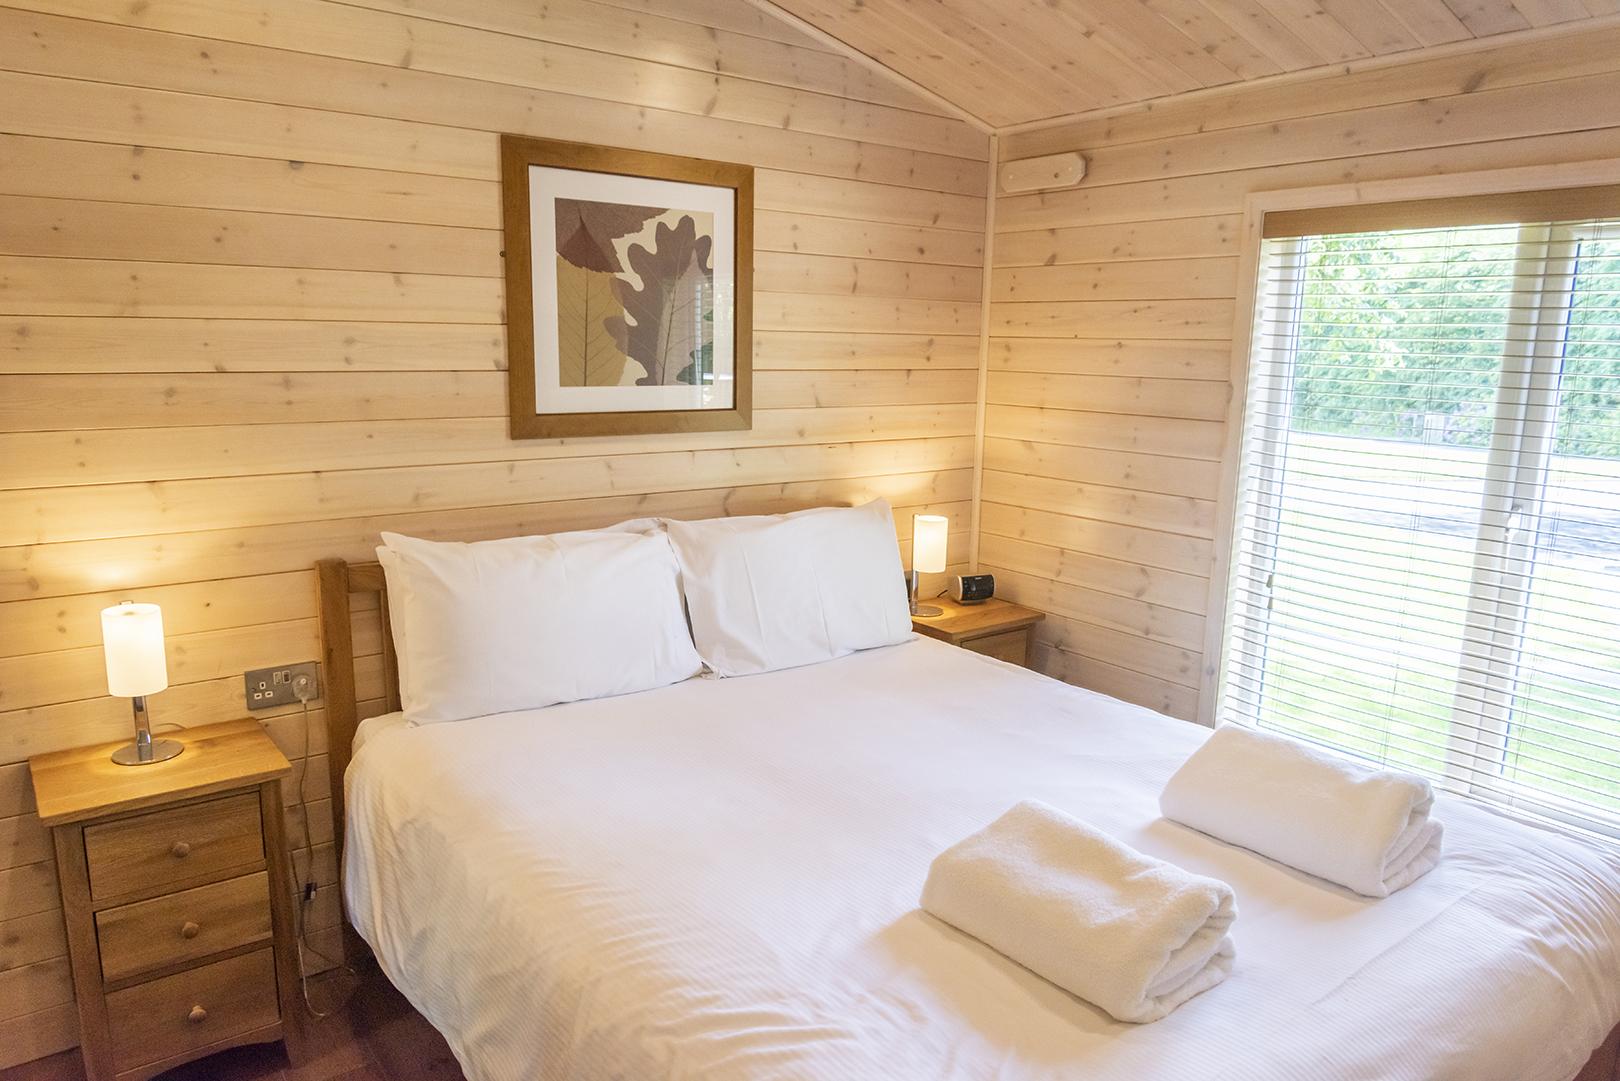 darwin forest bedroom_2.jpg